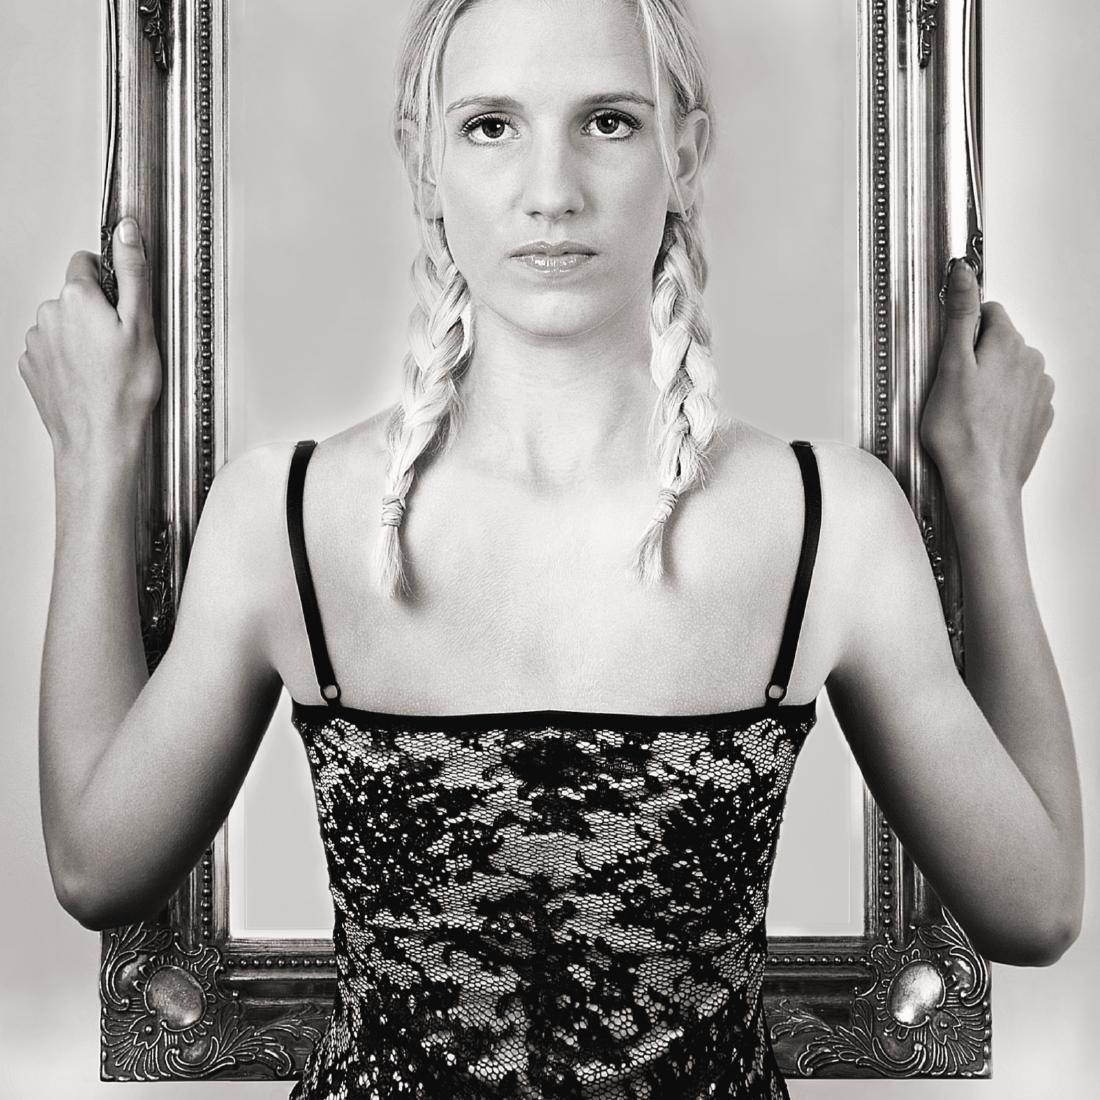 Dominic Rouse Mirror Image Print - 7